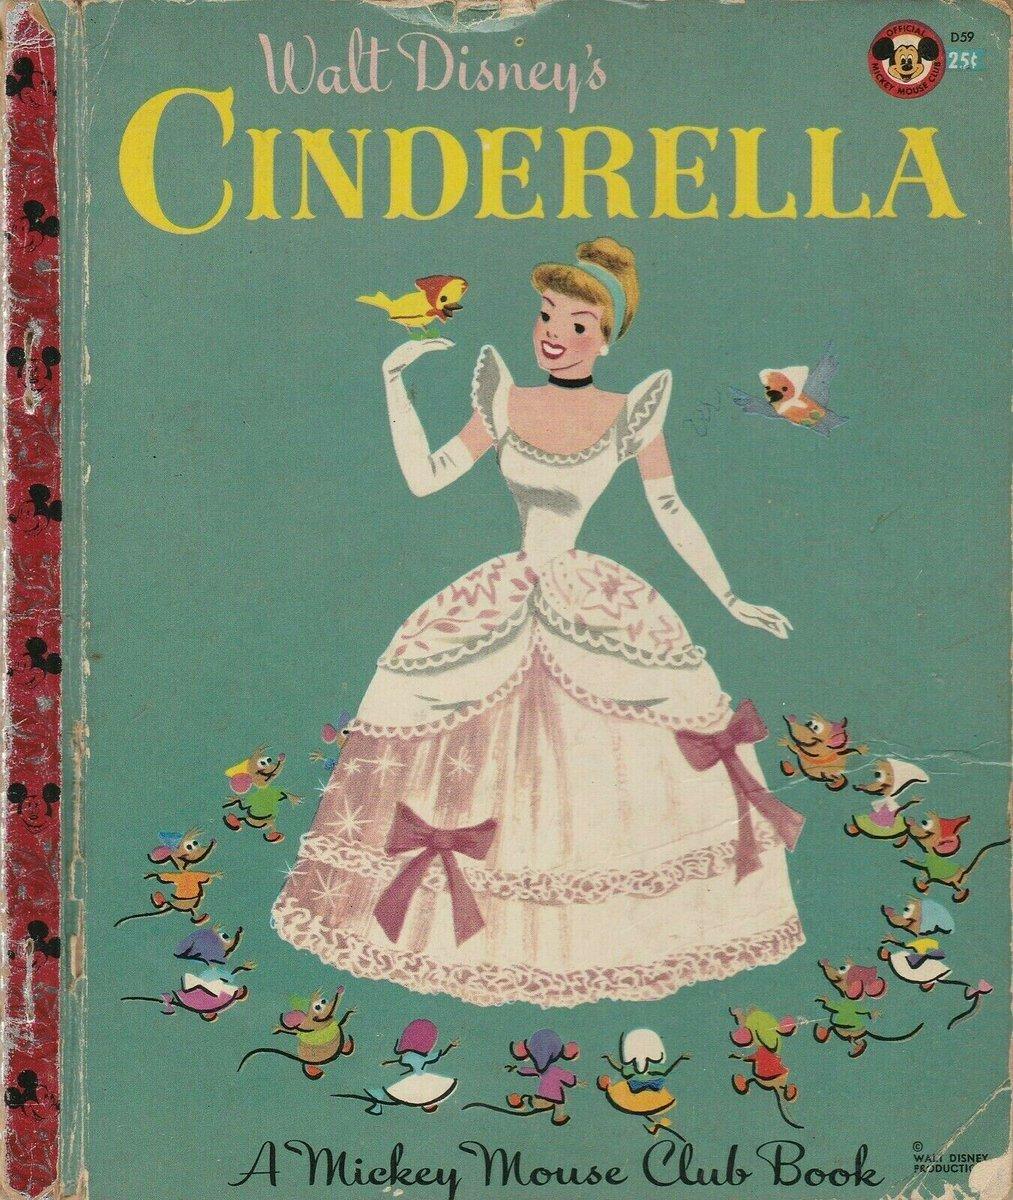 Walt Disney's Cinderella 1950 A Mickey Mouse Club Little Golden Book   eBay http://ow.ly/o3qQ30qN2La  #vintage #childrensbooks #Cinderella pic.twitter.com/NHVMnN4Grd